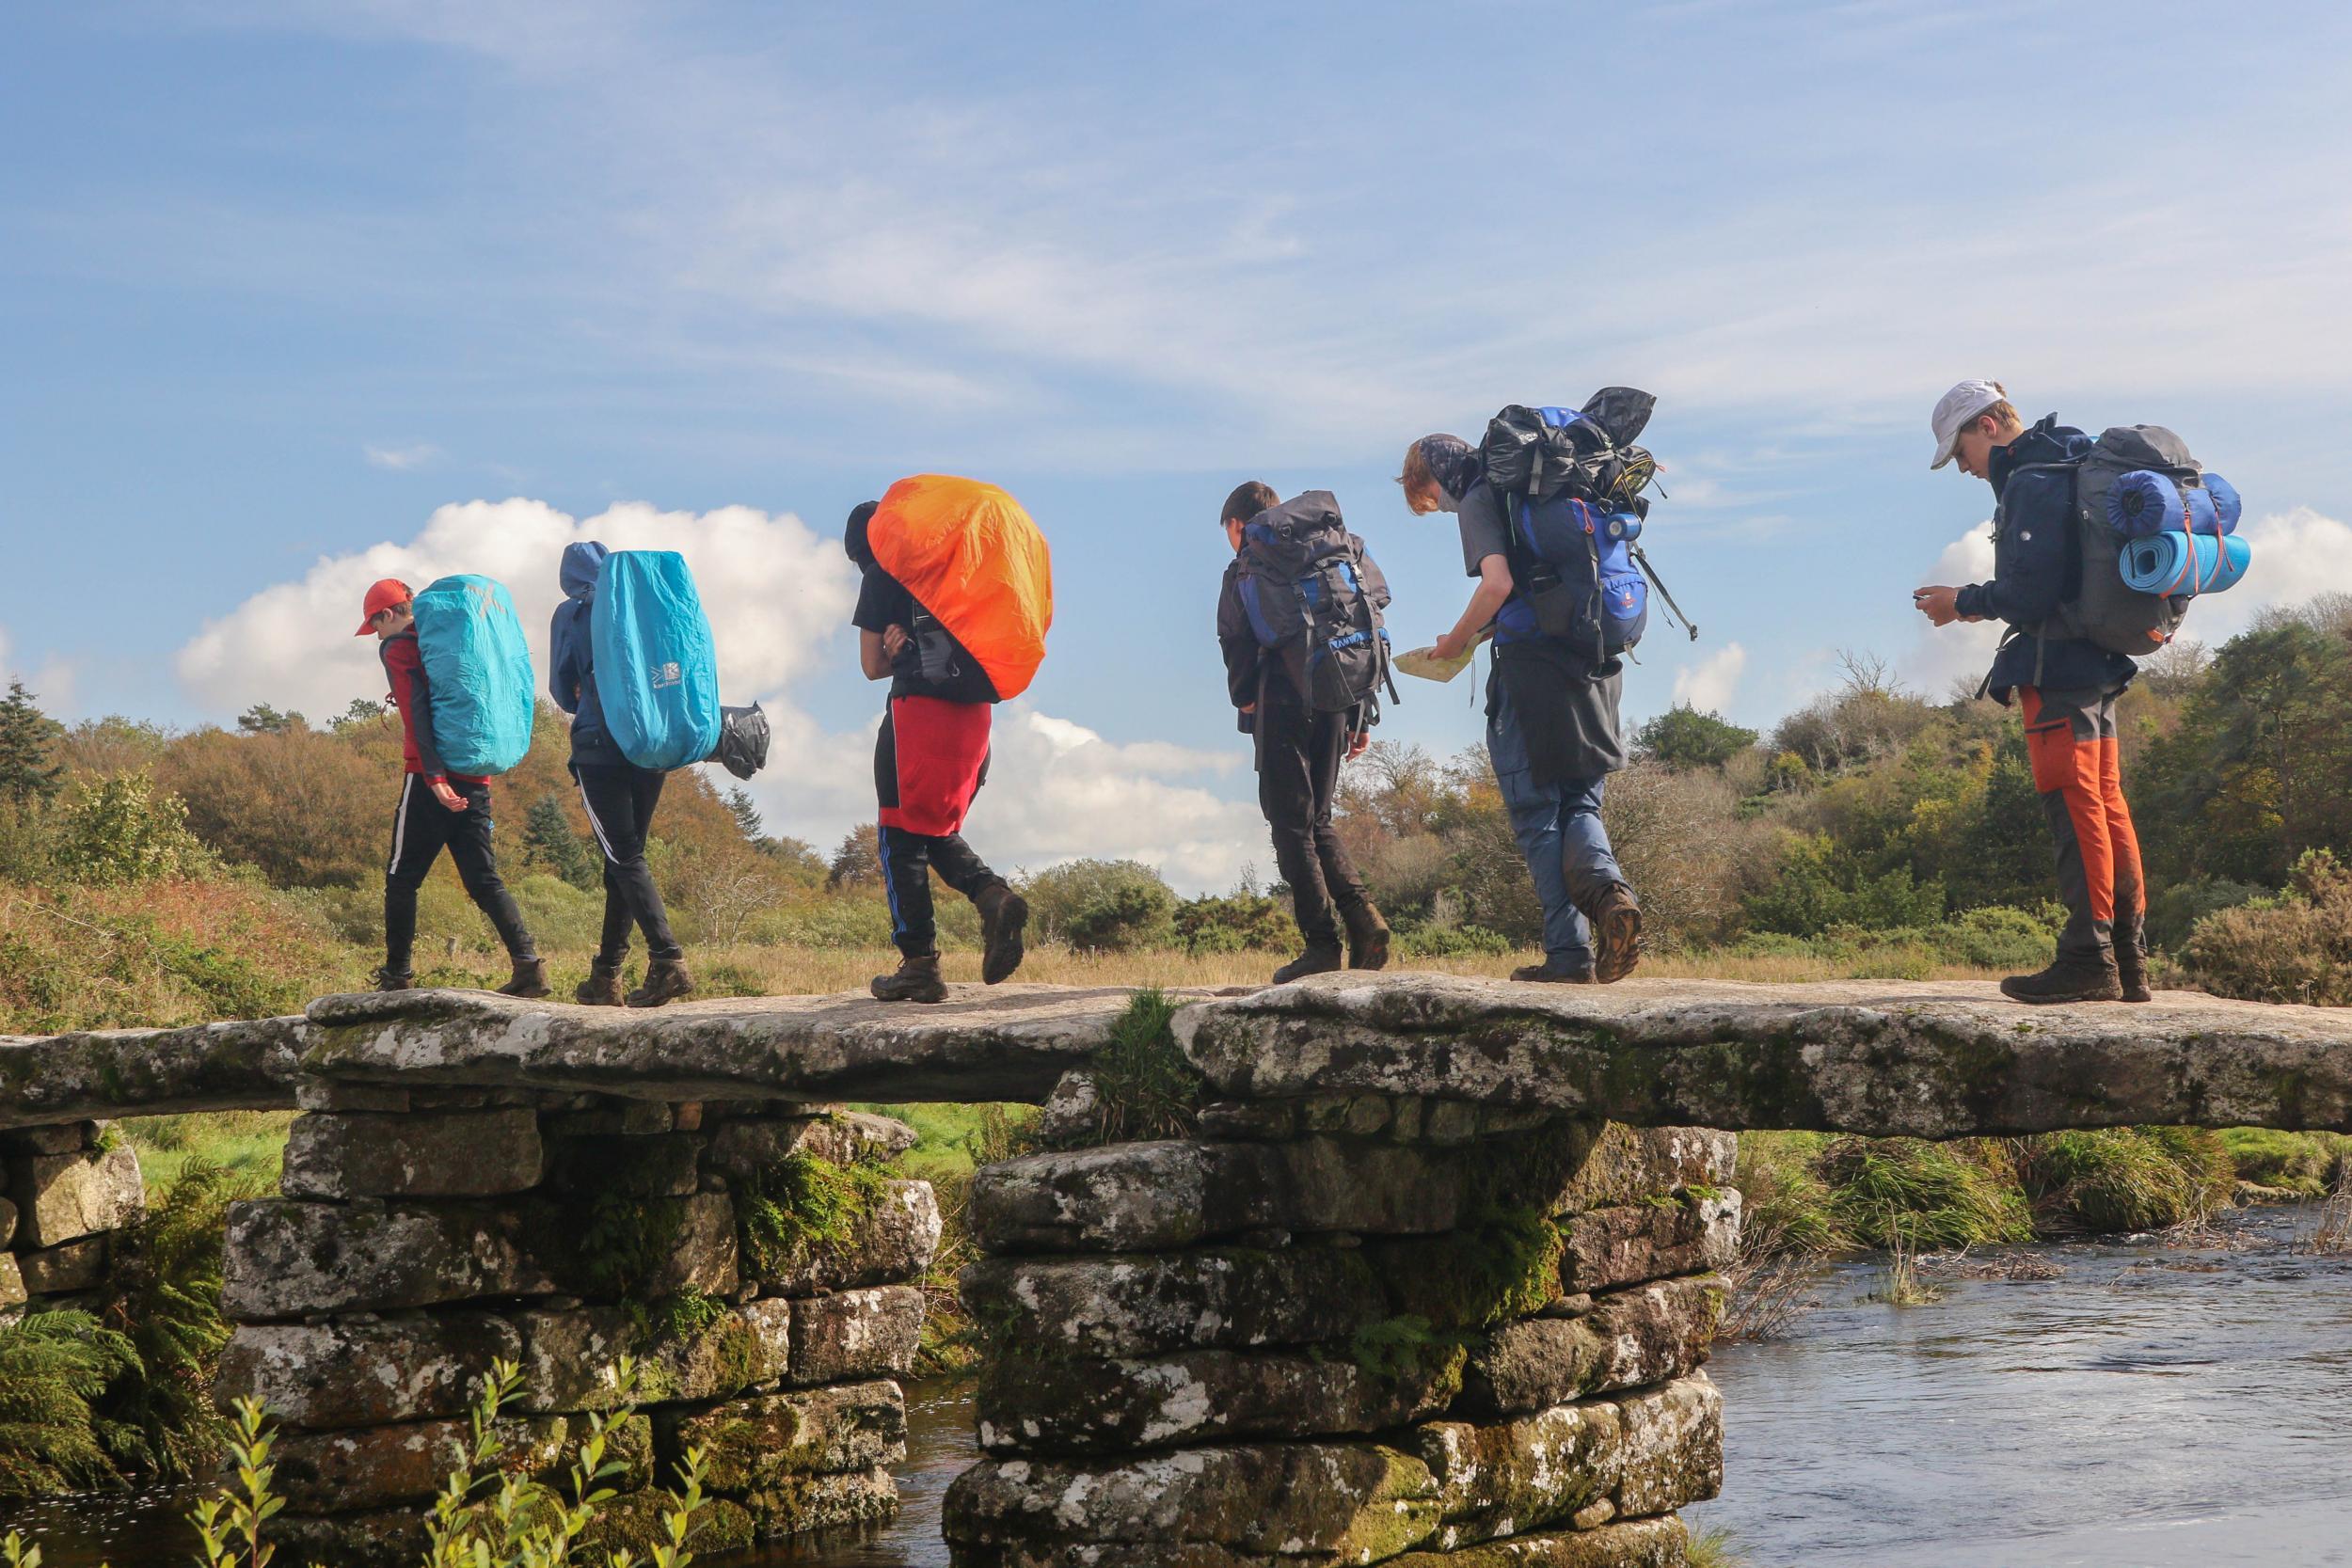 students with large rucksacks walking over stone bridge